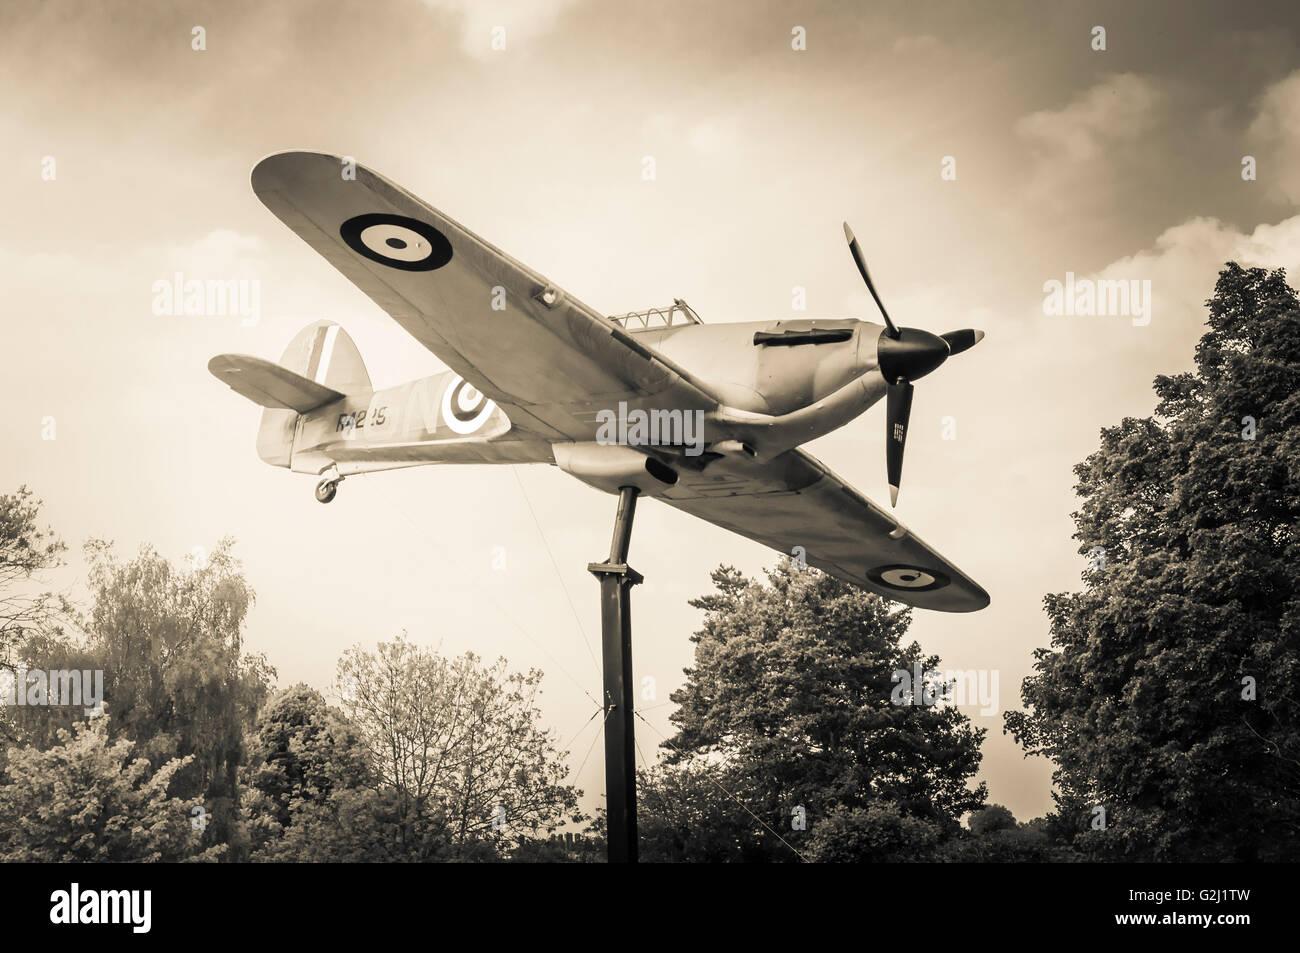 Hawker Hurricane a British single-seat fighter aircraft WW2 Model. - Stock Image